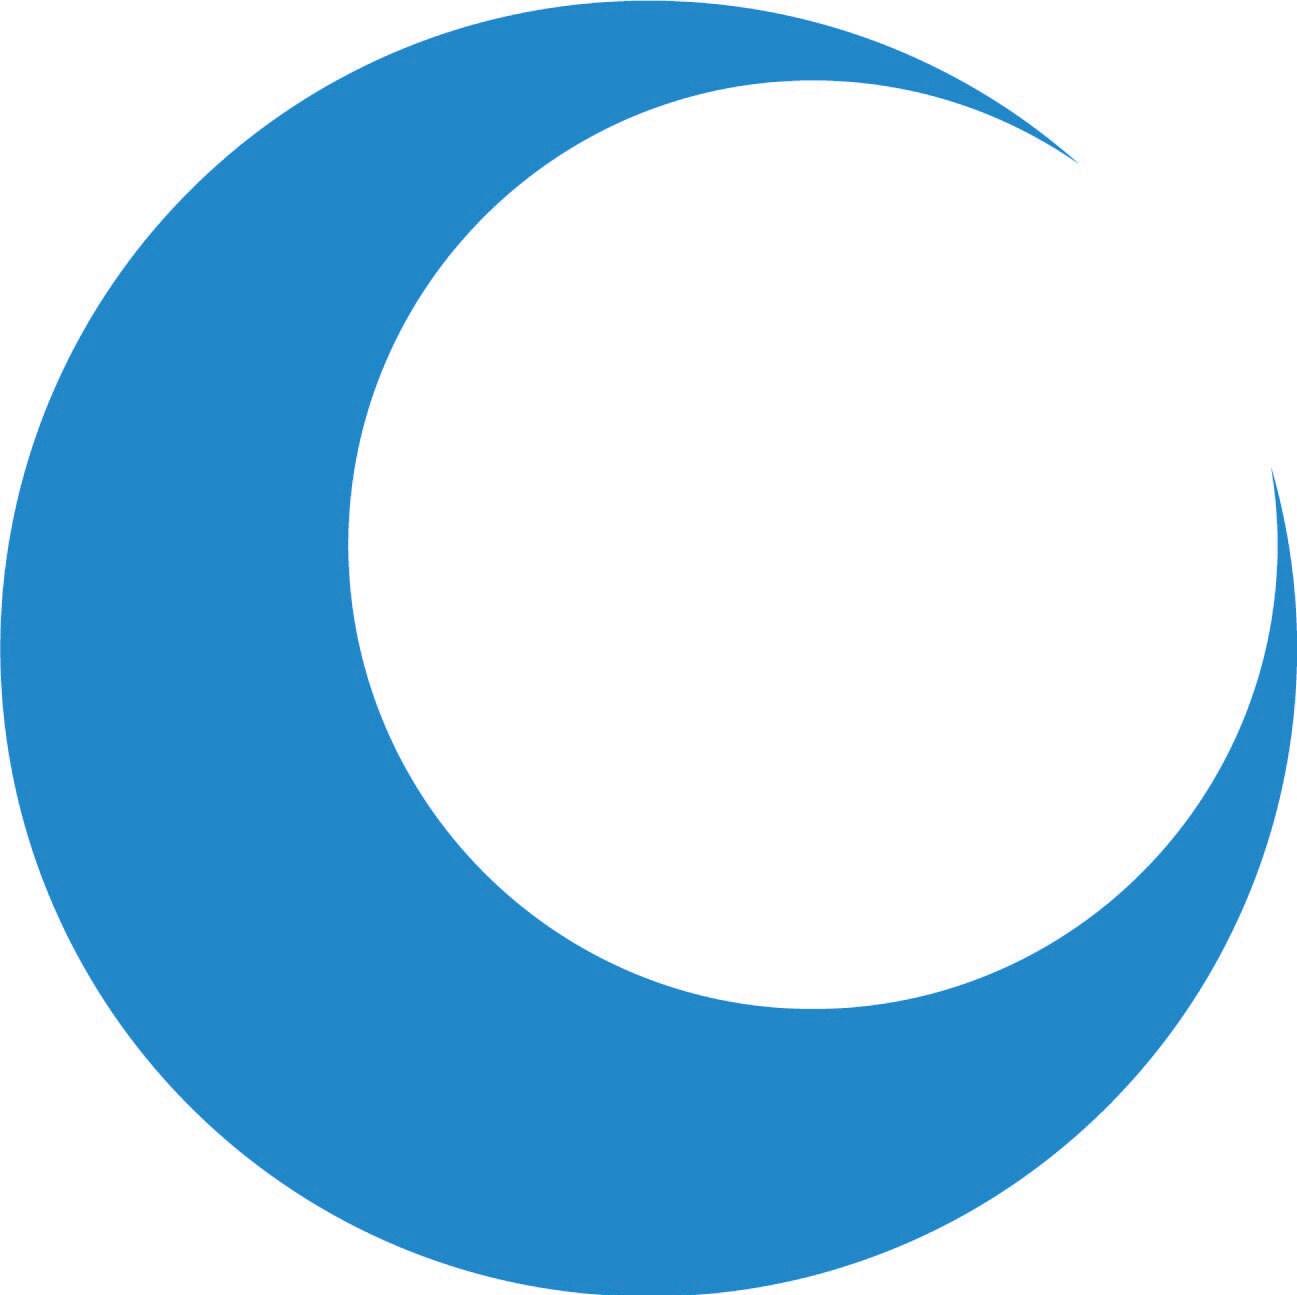 Crescent Moon Silhouette Crescent moon.